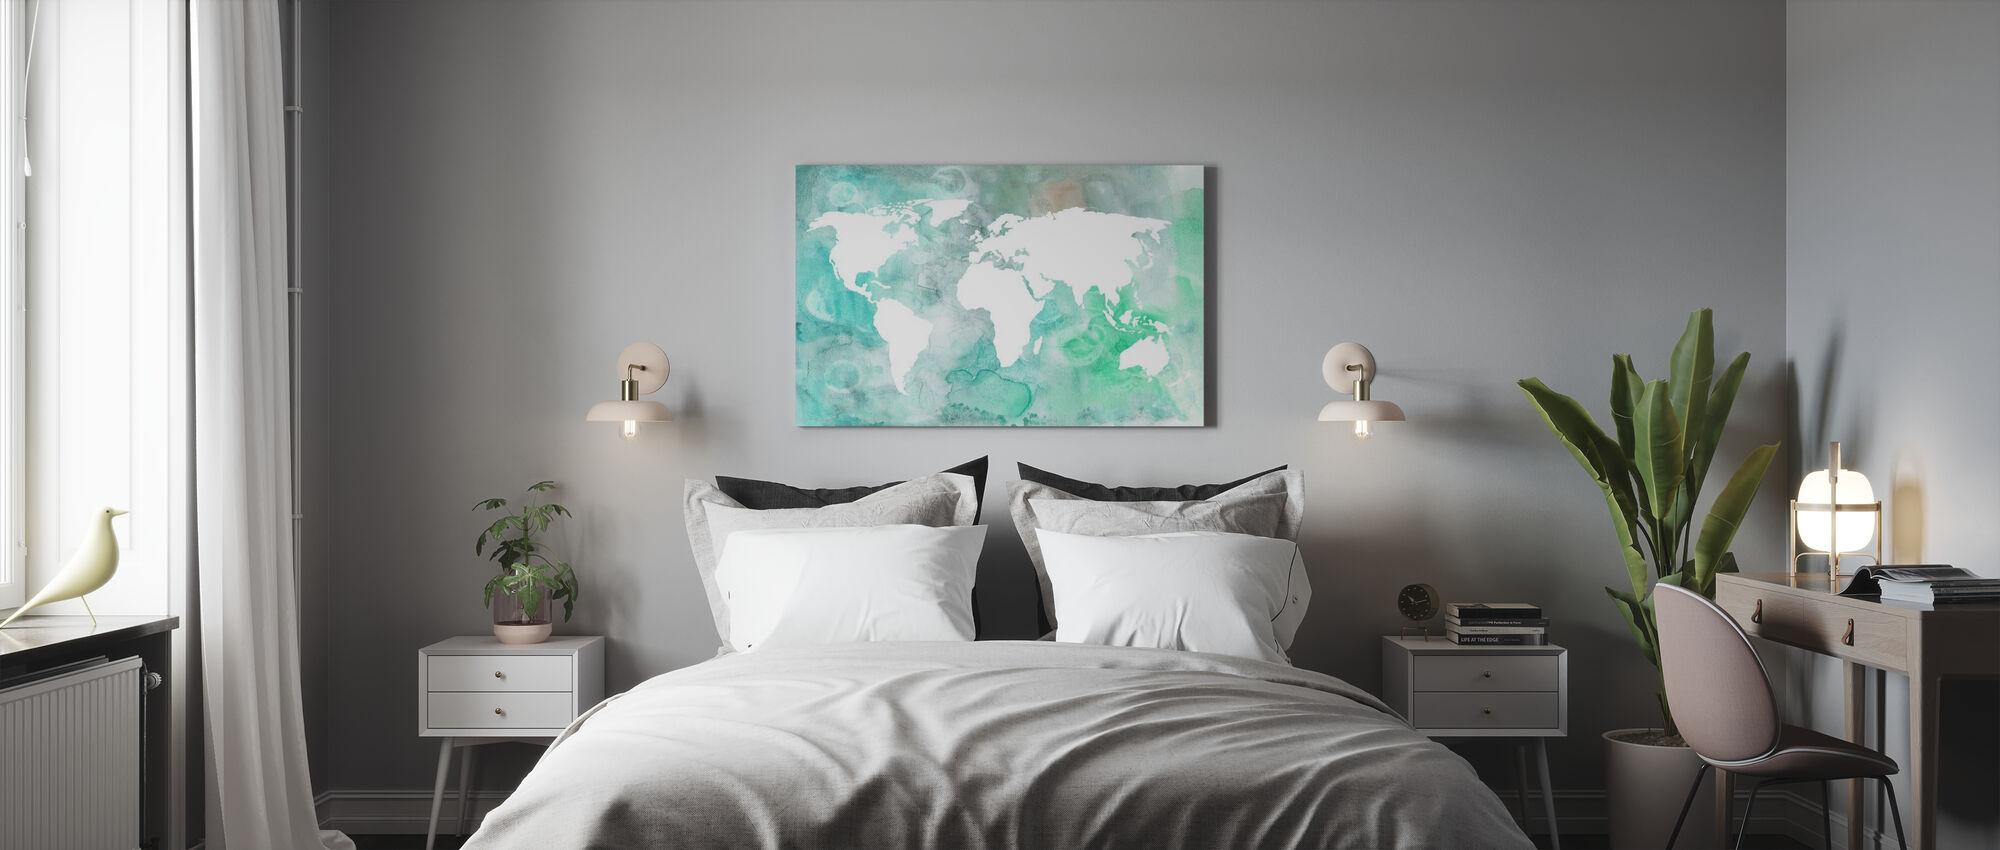 Dreaming of Earth II - Canvas print - Bedroom